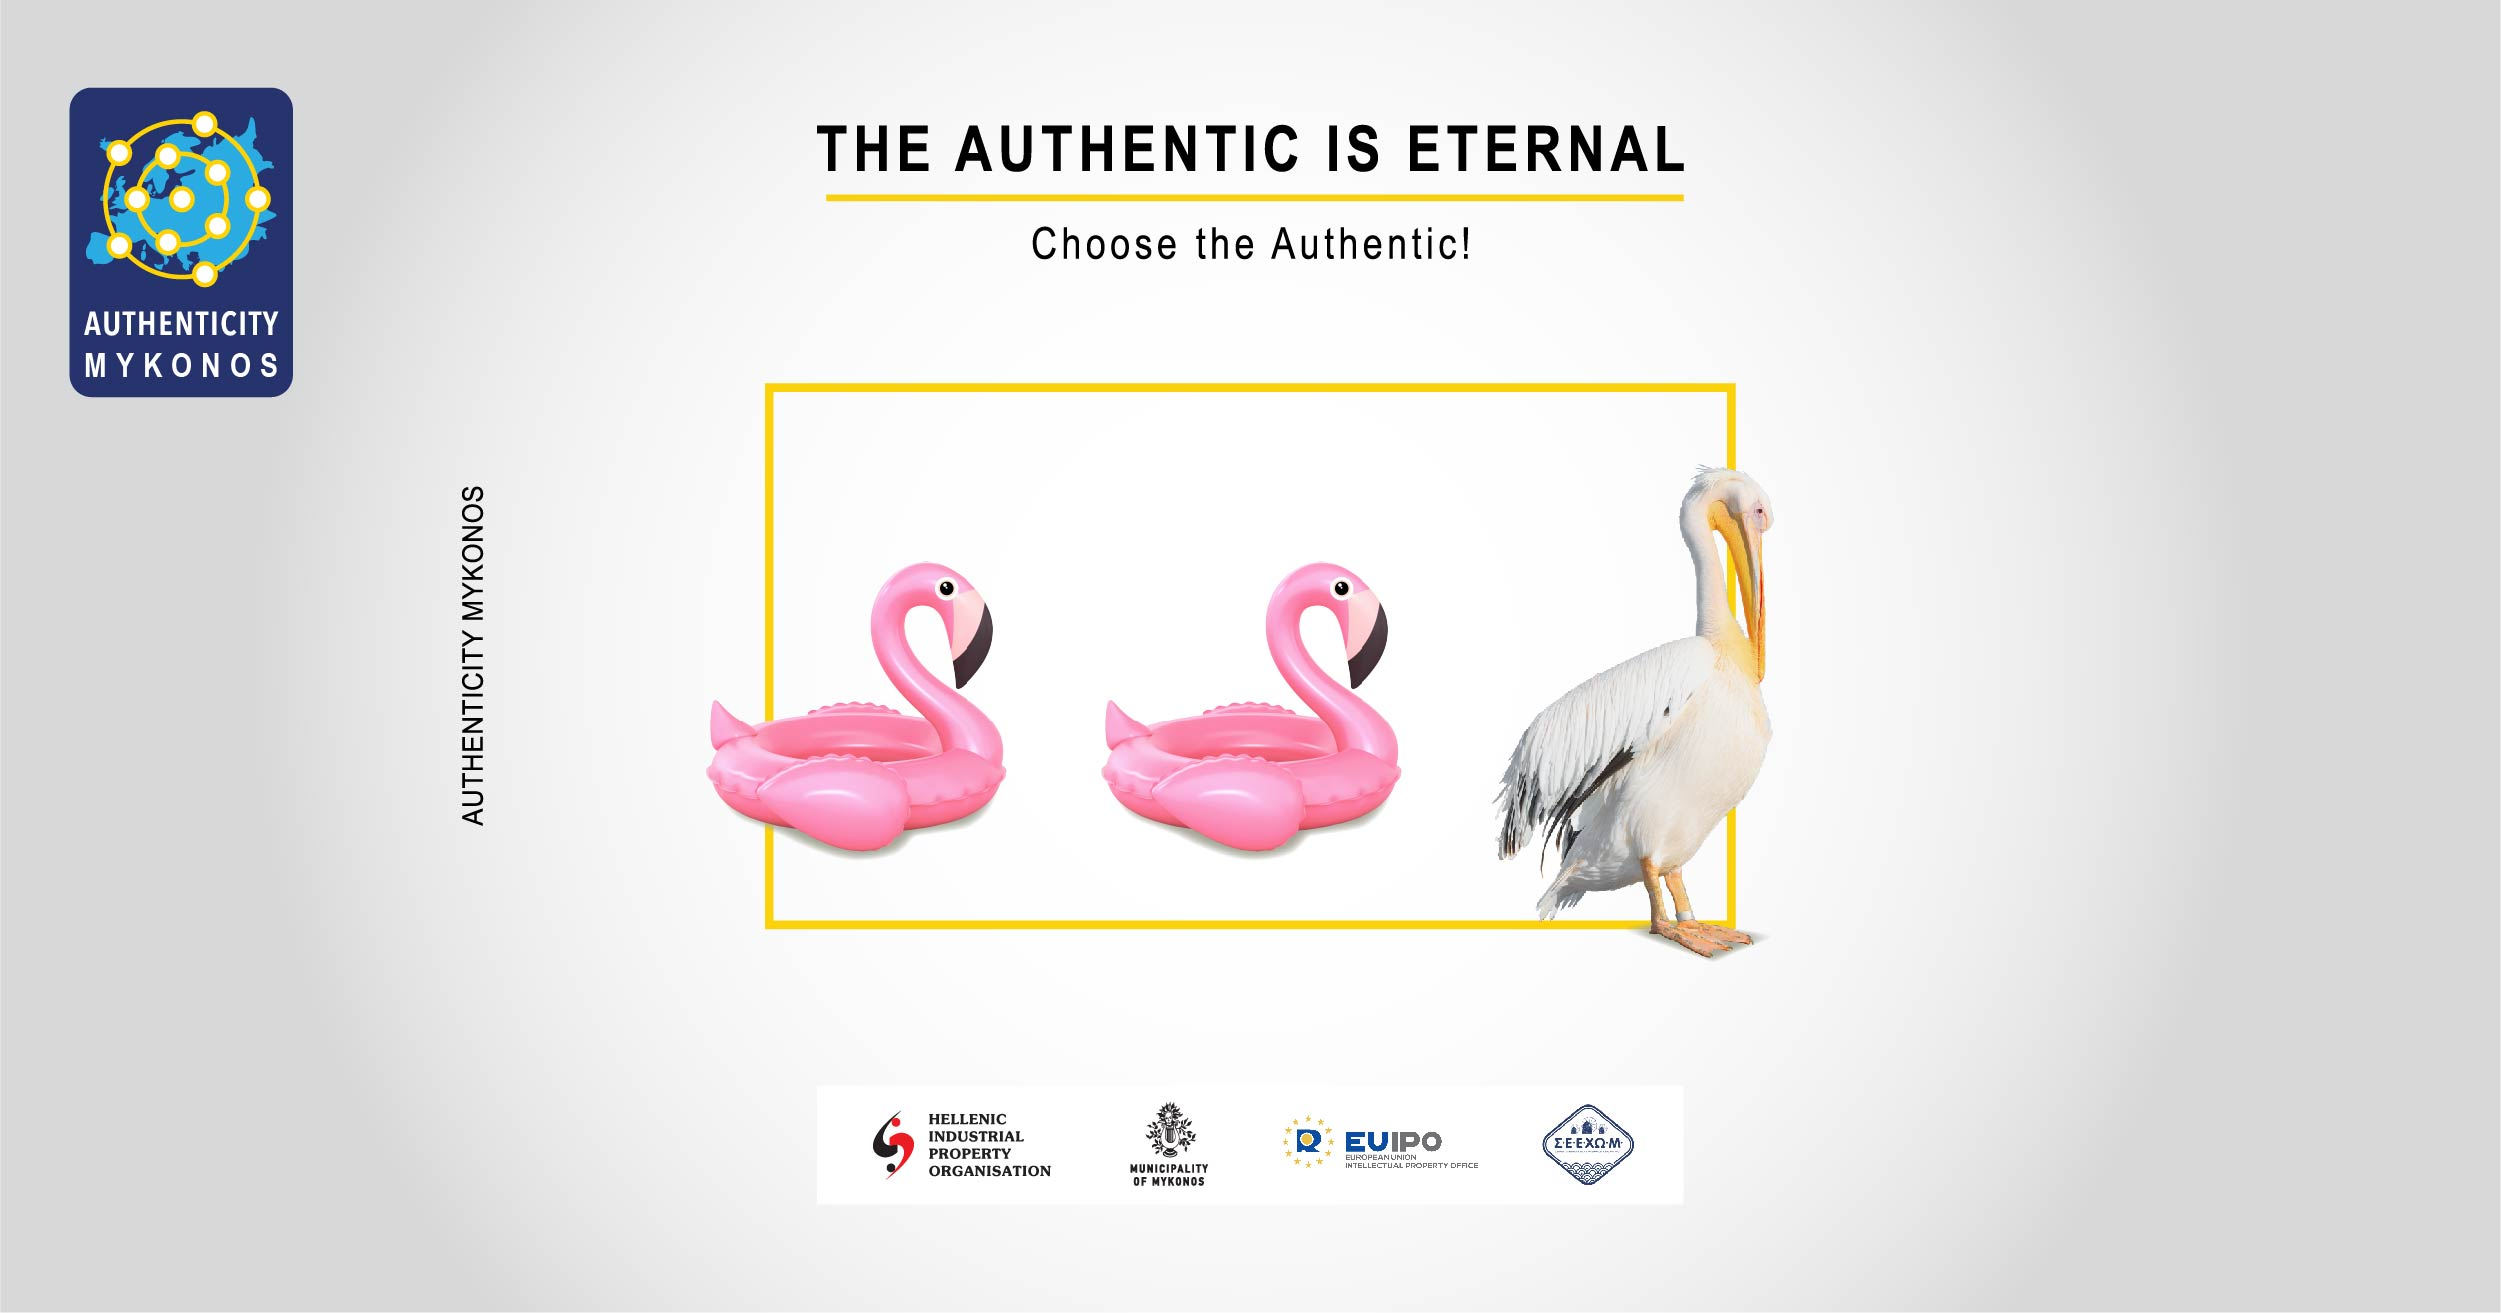 Authenticity Mykonos_social banner 02